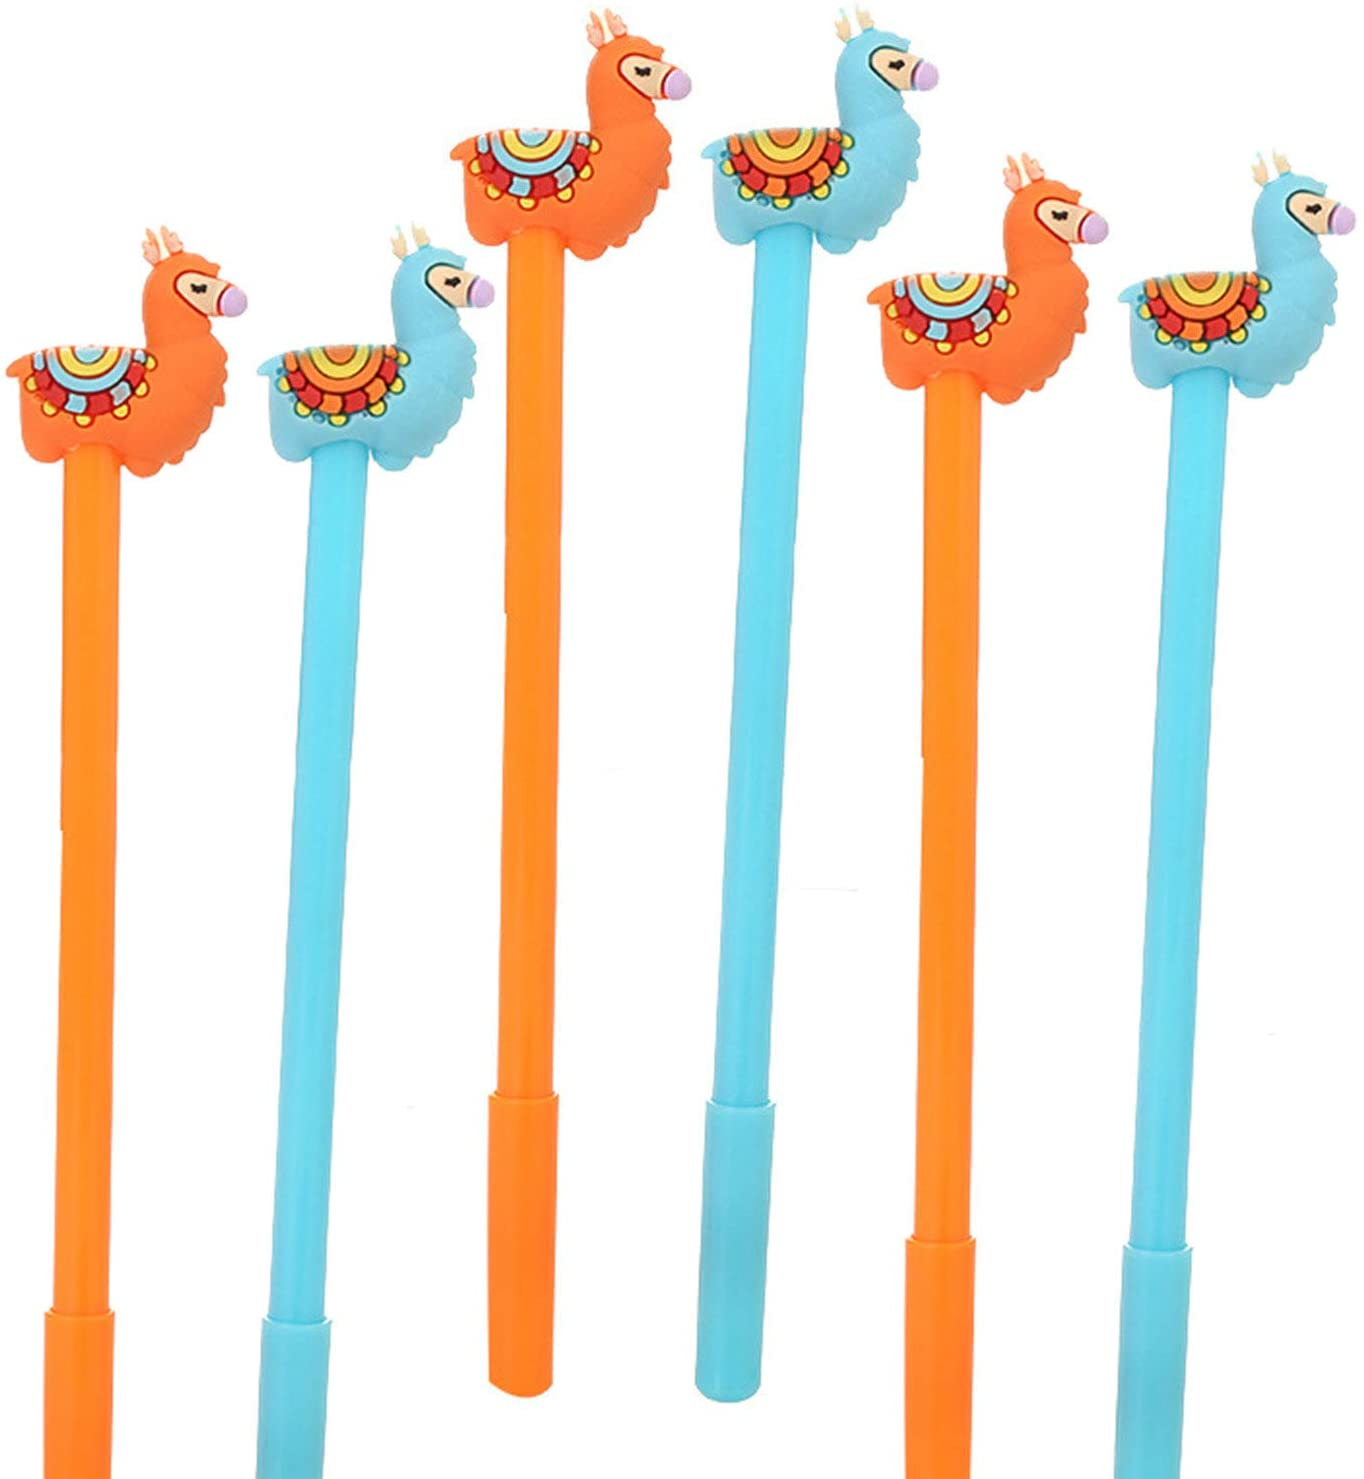 WIN-MARKET Animal llama Alpaca Sheep Camel Gel Pens Set Fashion Cute Colorful Kawaii Lovely Colorful Gel Ball Pens Office School Supply Stationery pen(6PCS)